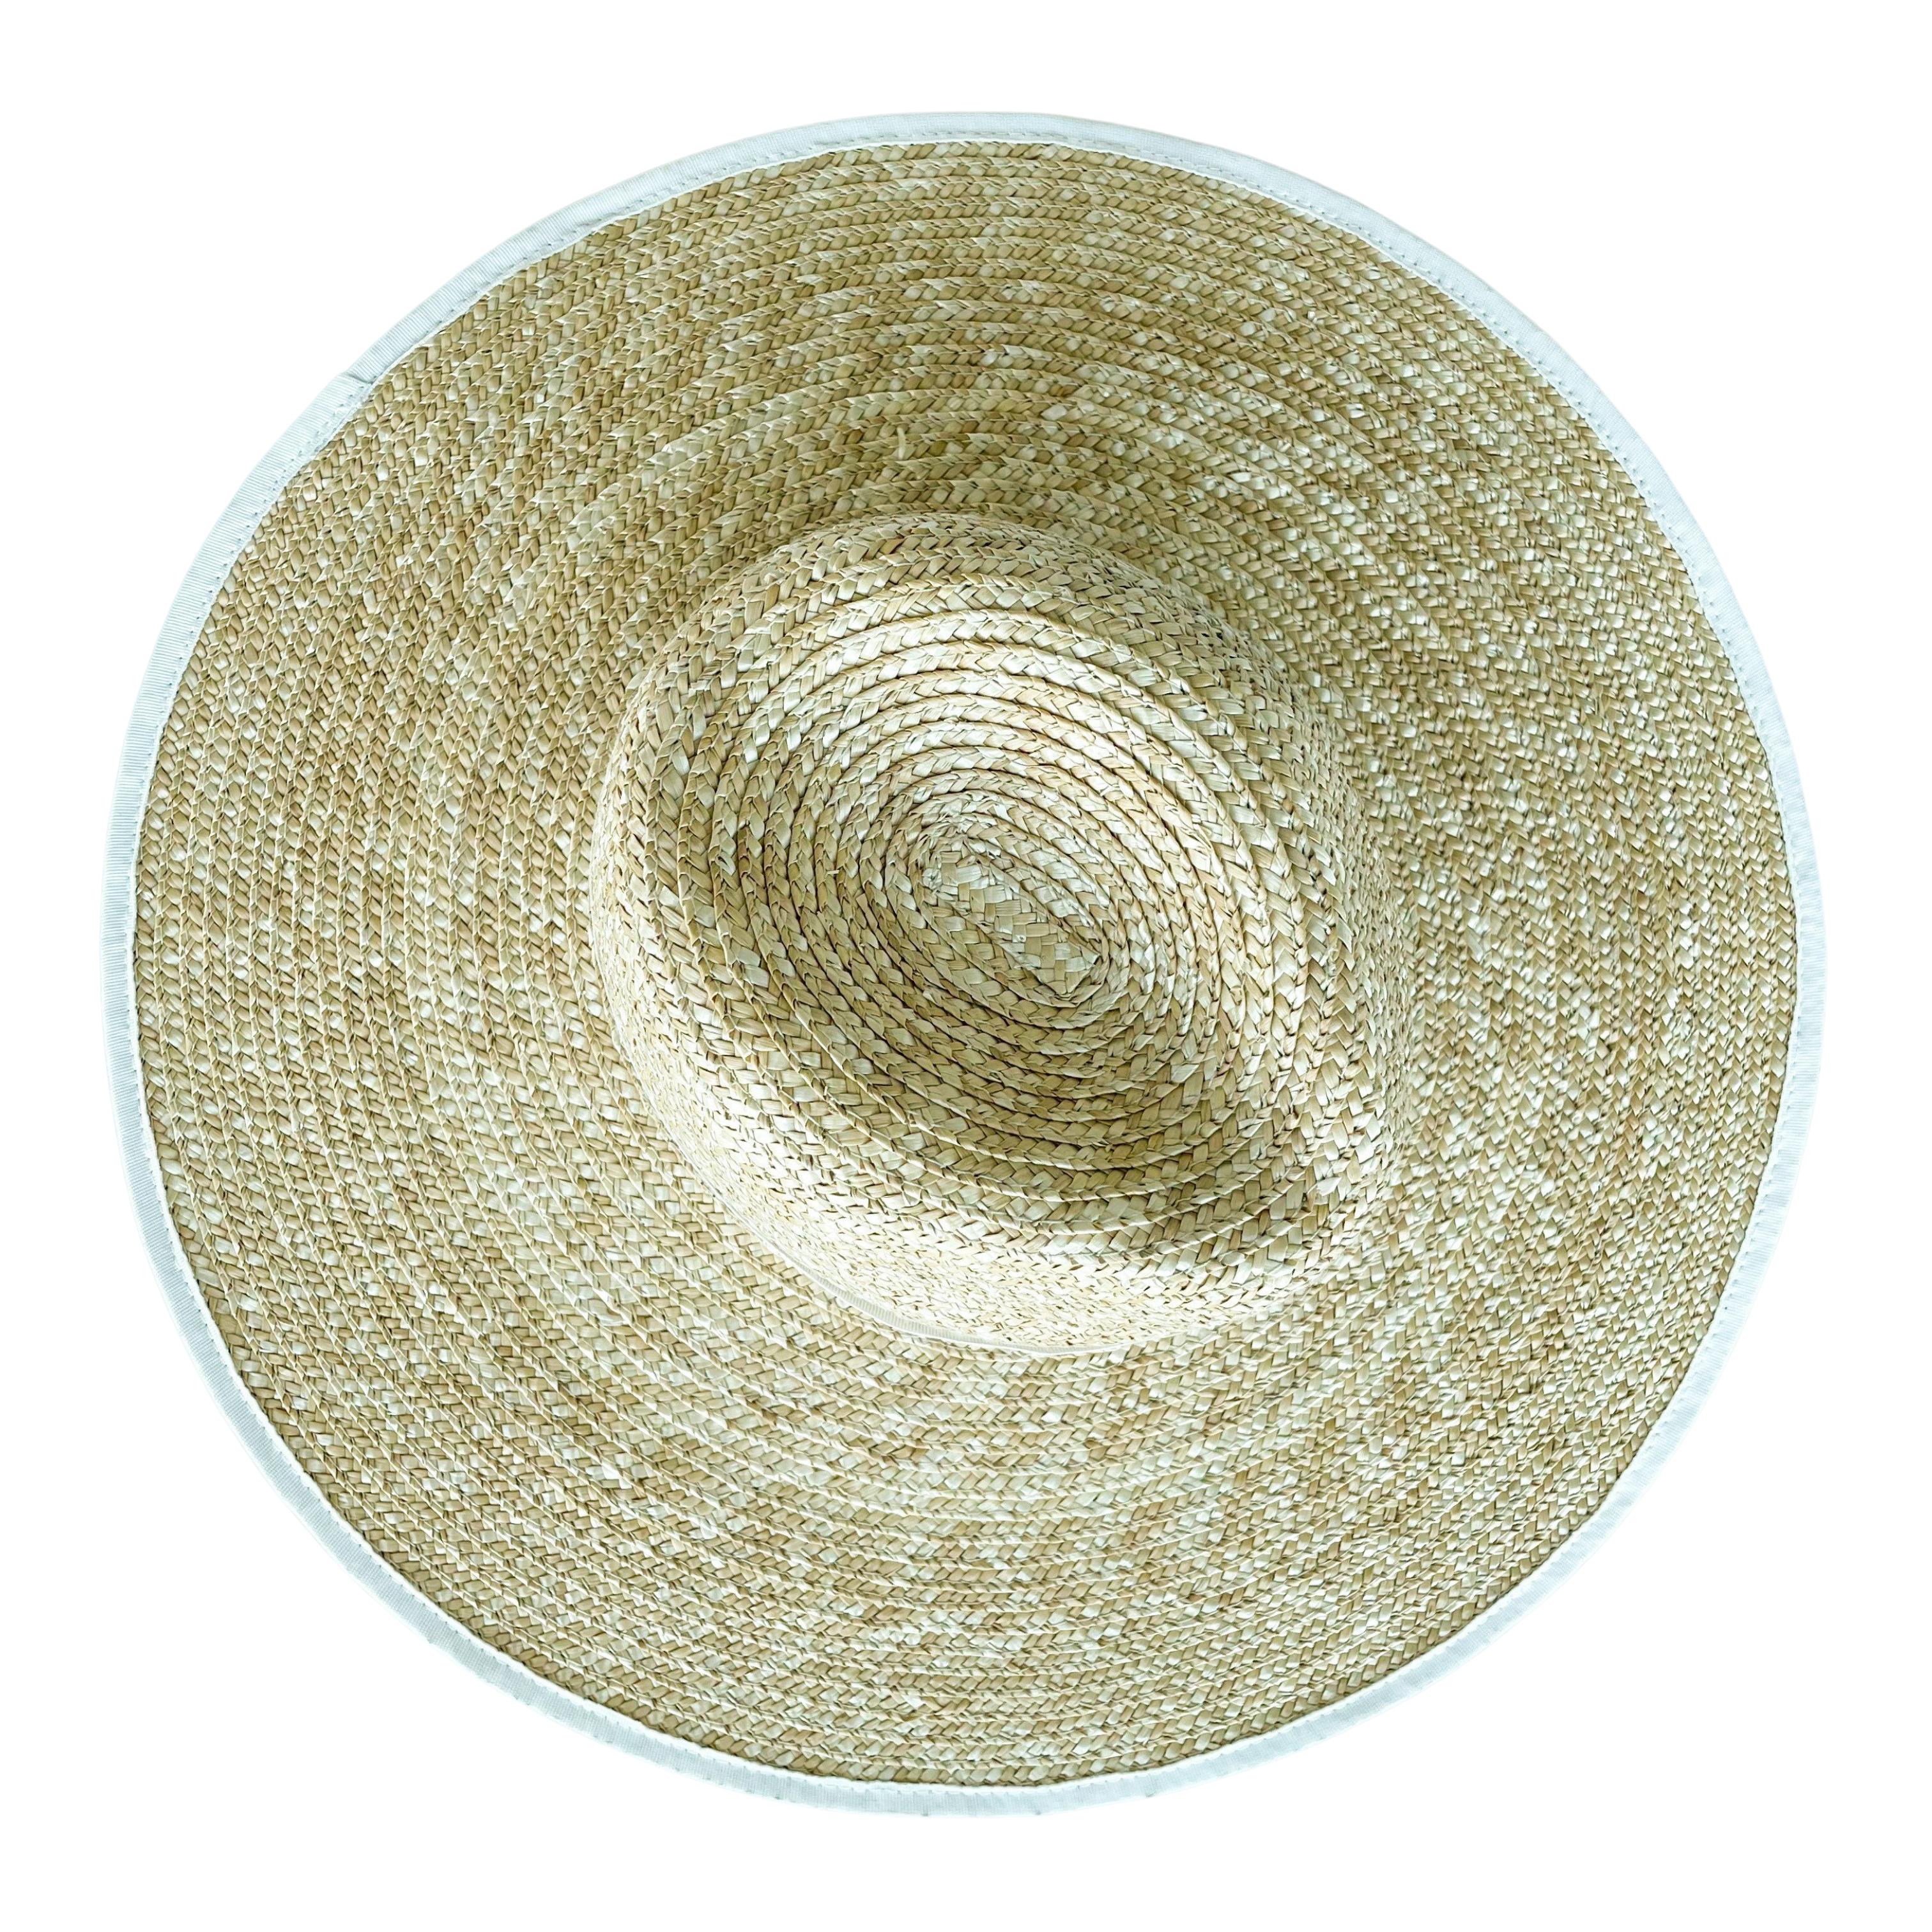 Elise fedora natural straw hat large brim